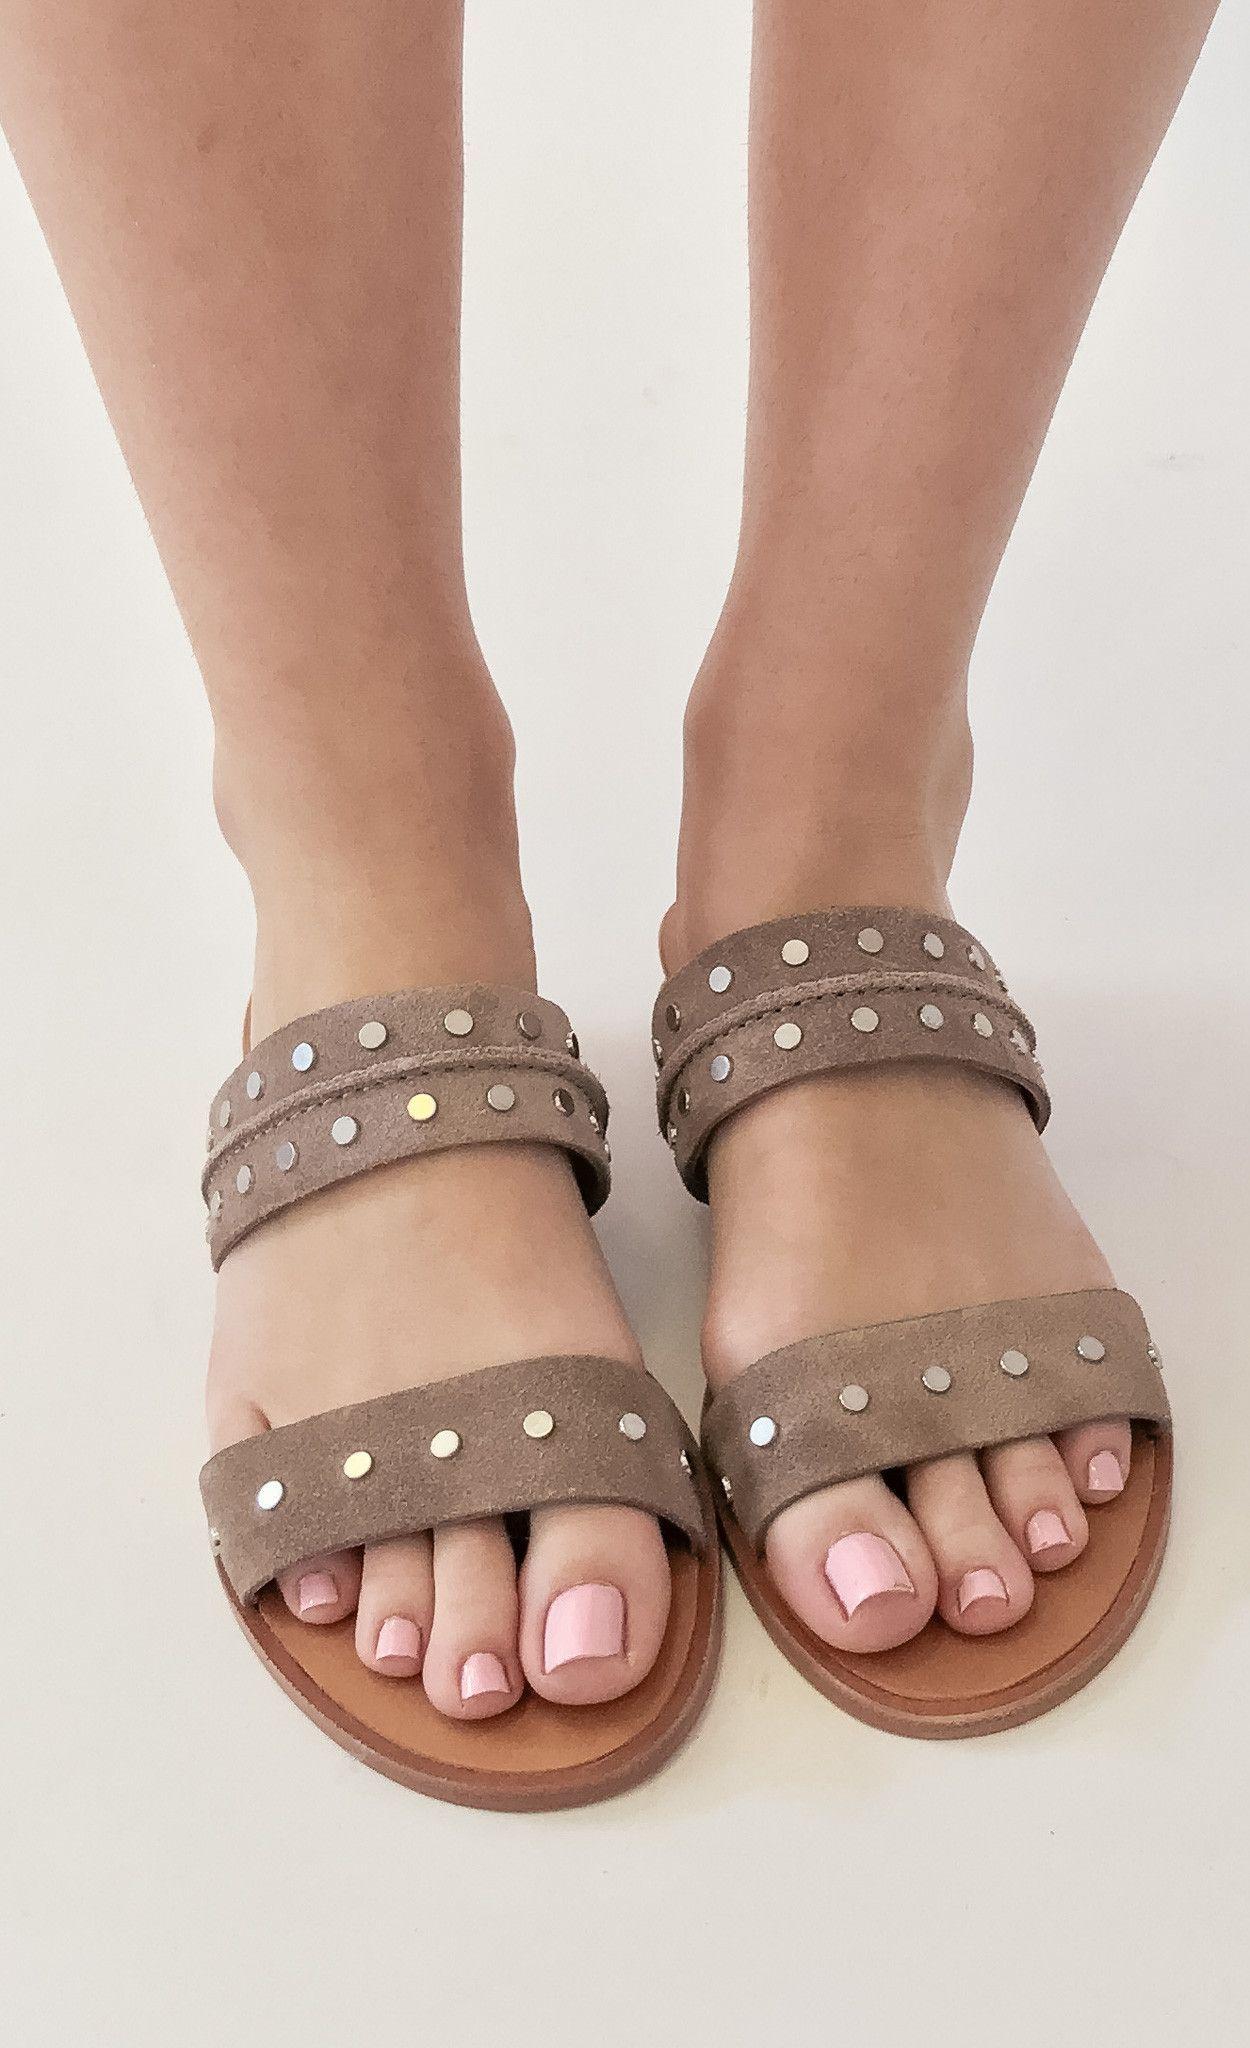 1cc59d5204e7 Dolce Vita Pacey Sandal | Walk This Way | Shoes, Sandals, Fashion